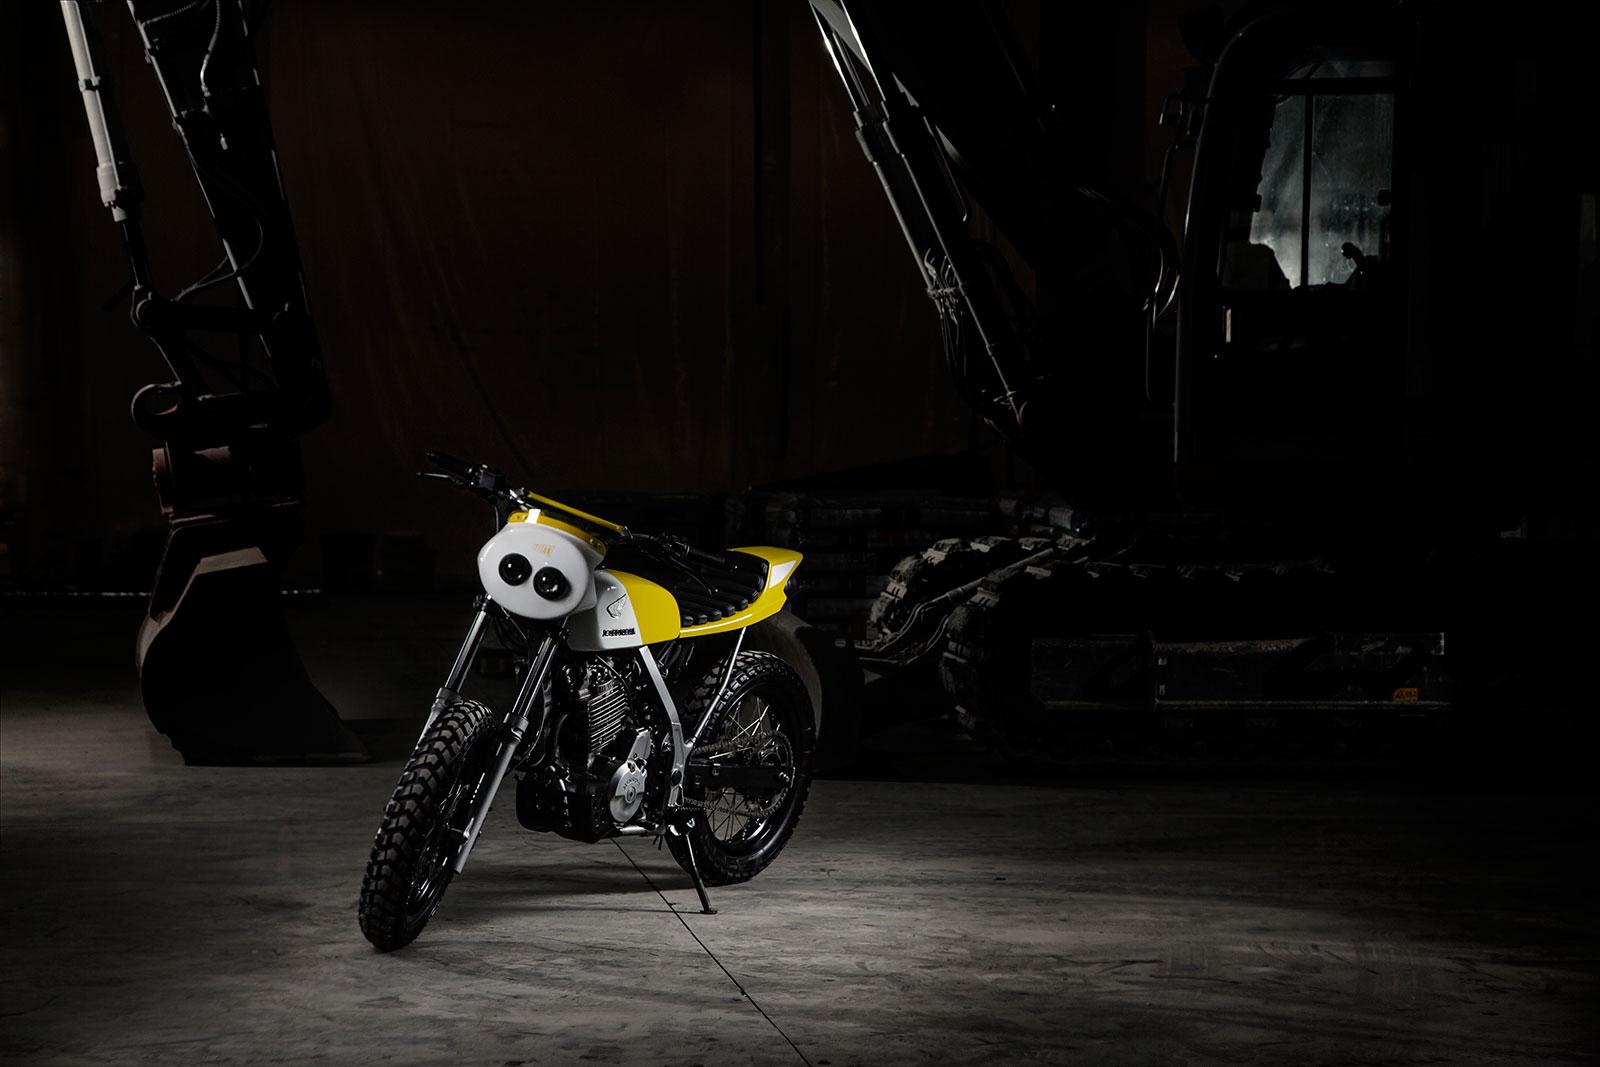 honda-nx650-dominator-by-titan-motorcycles-01